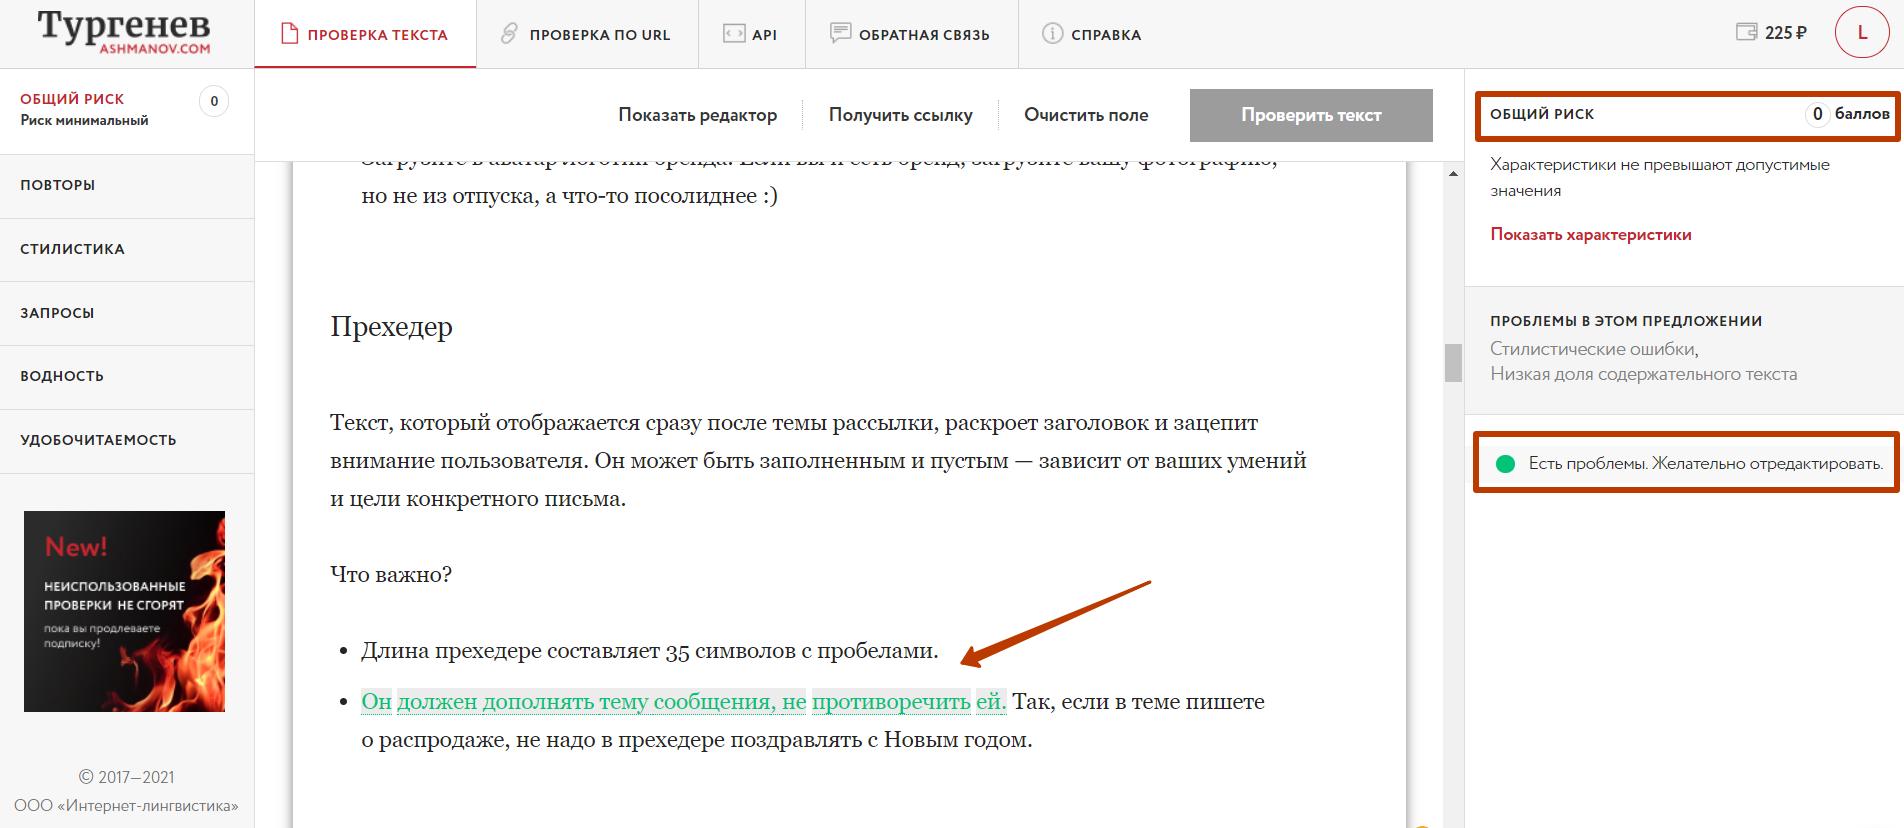 Проверка текста в Тургенев